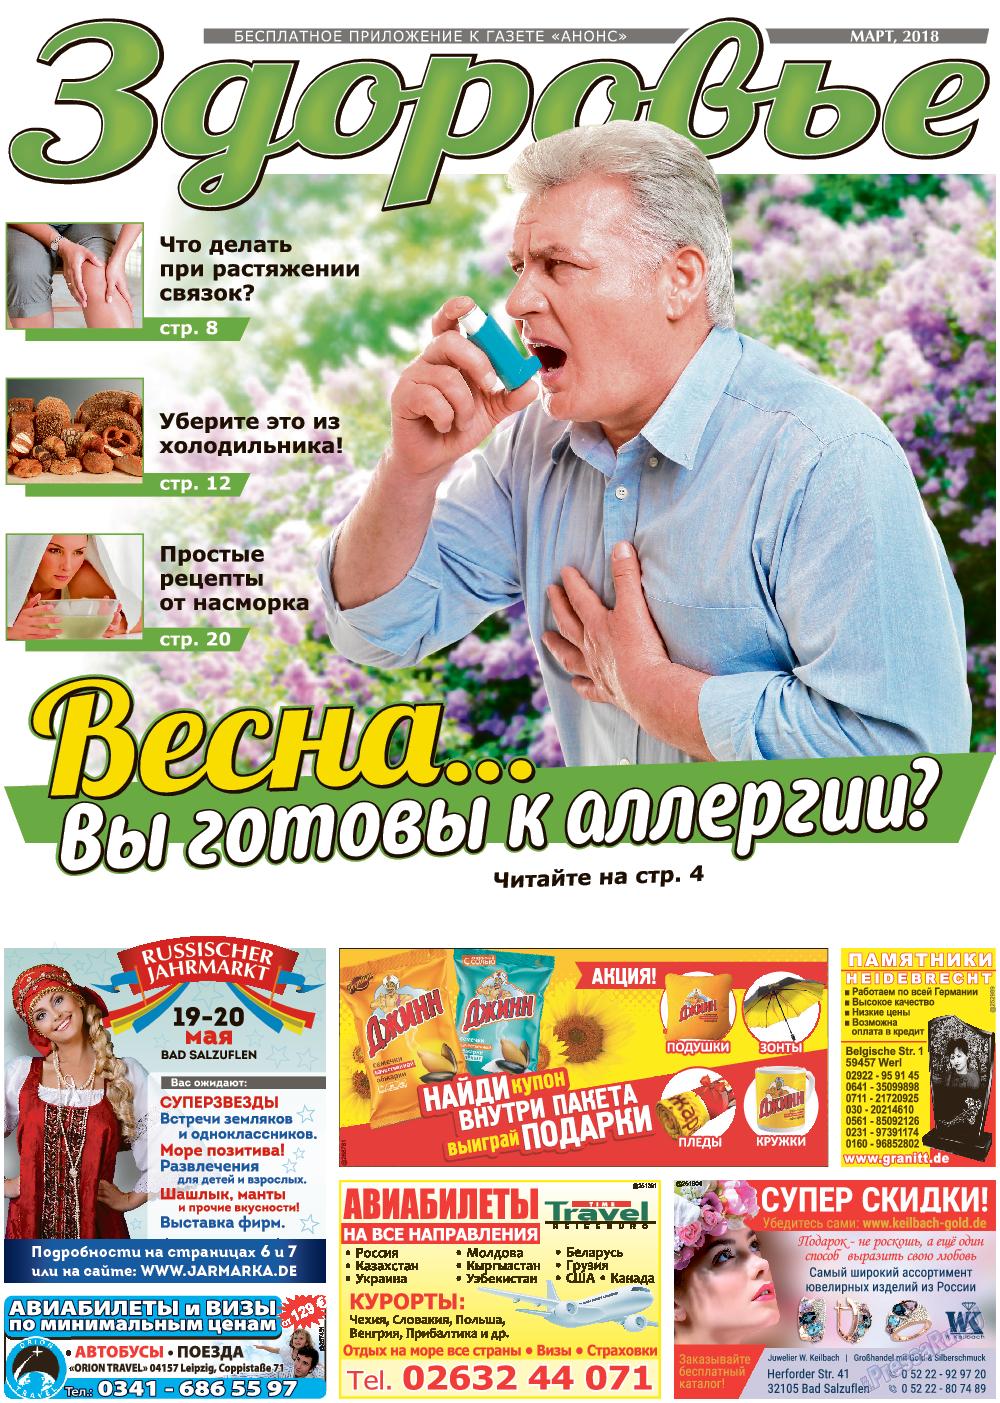 Здоровье (газета). 2018 год, номер 3, стр. 1